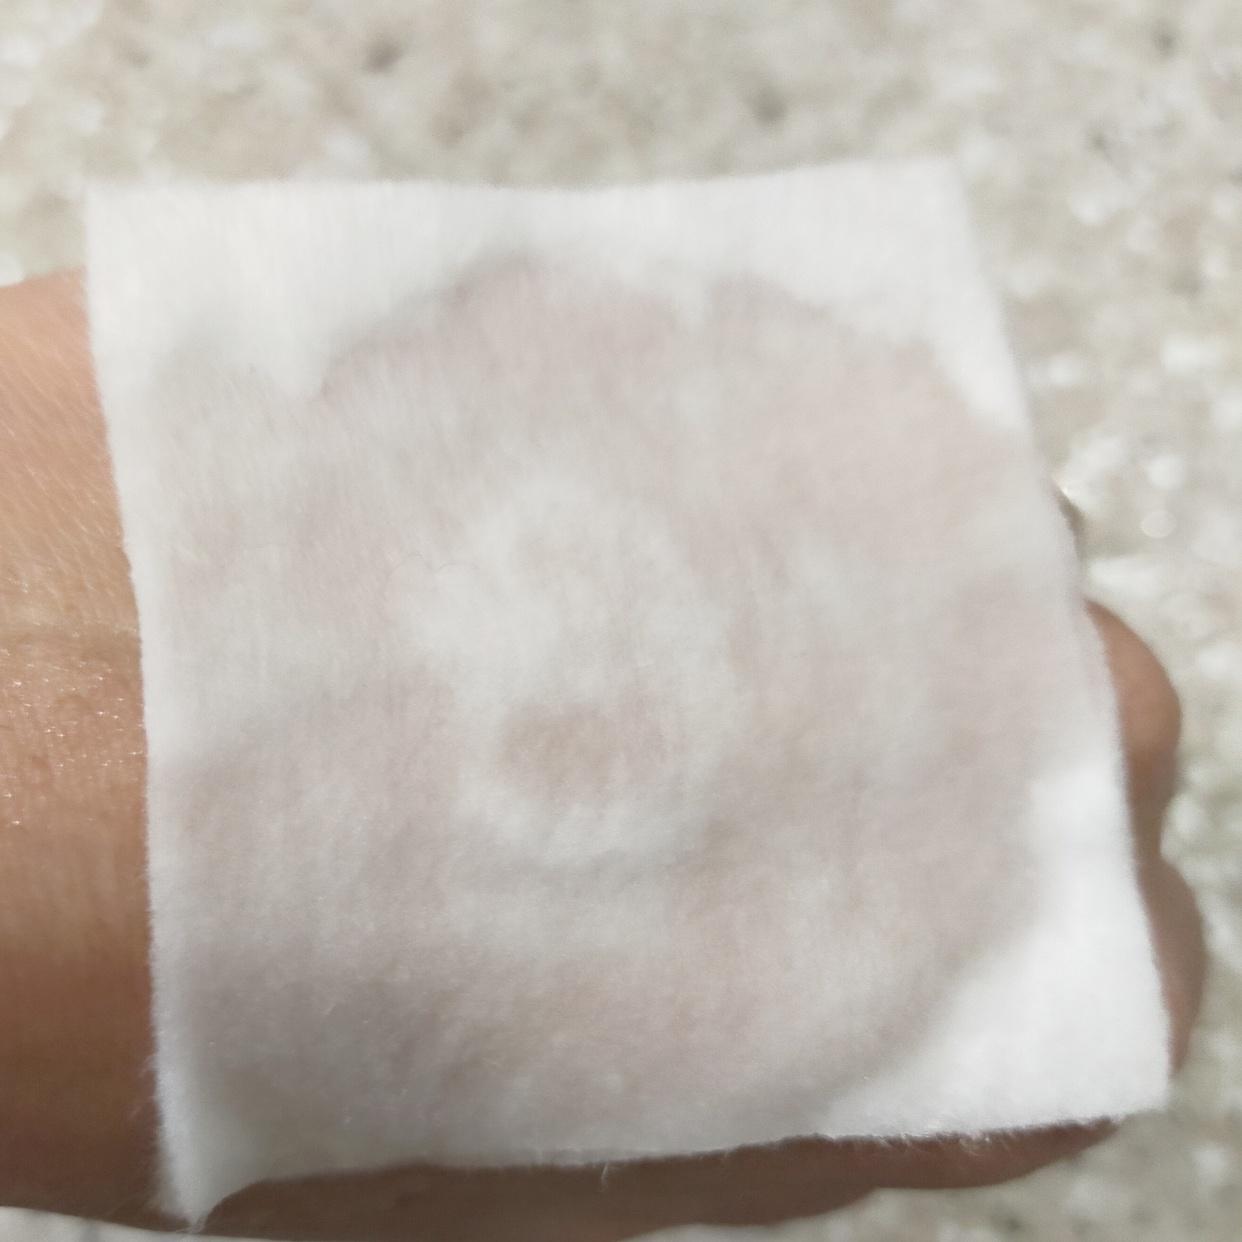 ALLNA ORGANIC(オルナ オーガニック)拭き取り化粧水を使ったみこさんのクチコミ画像4